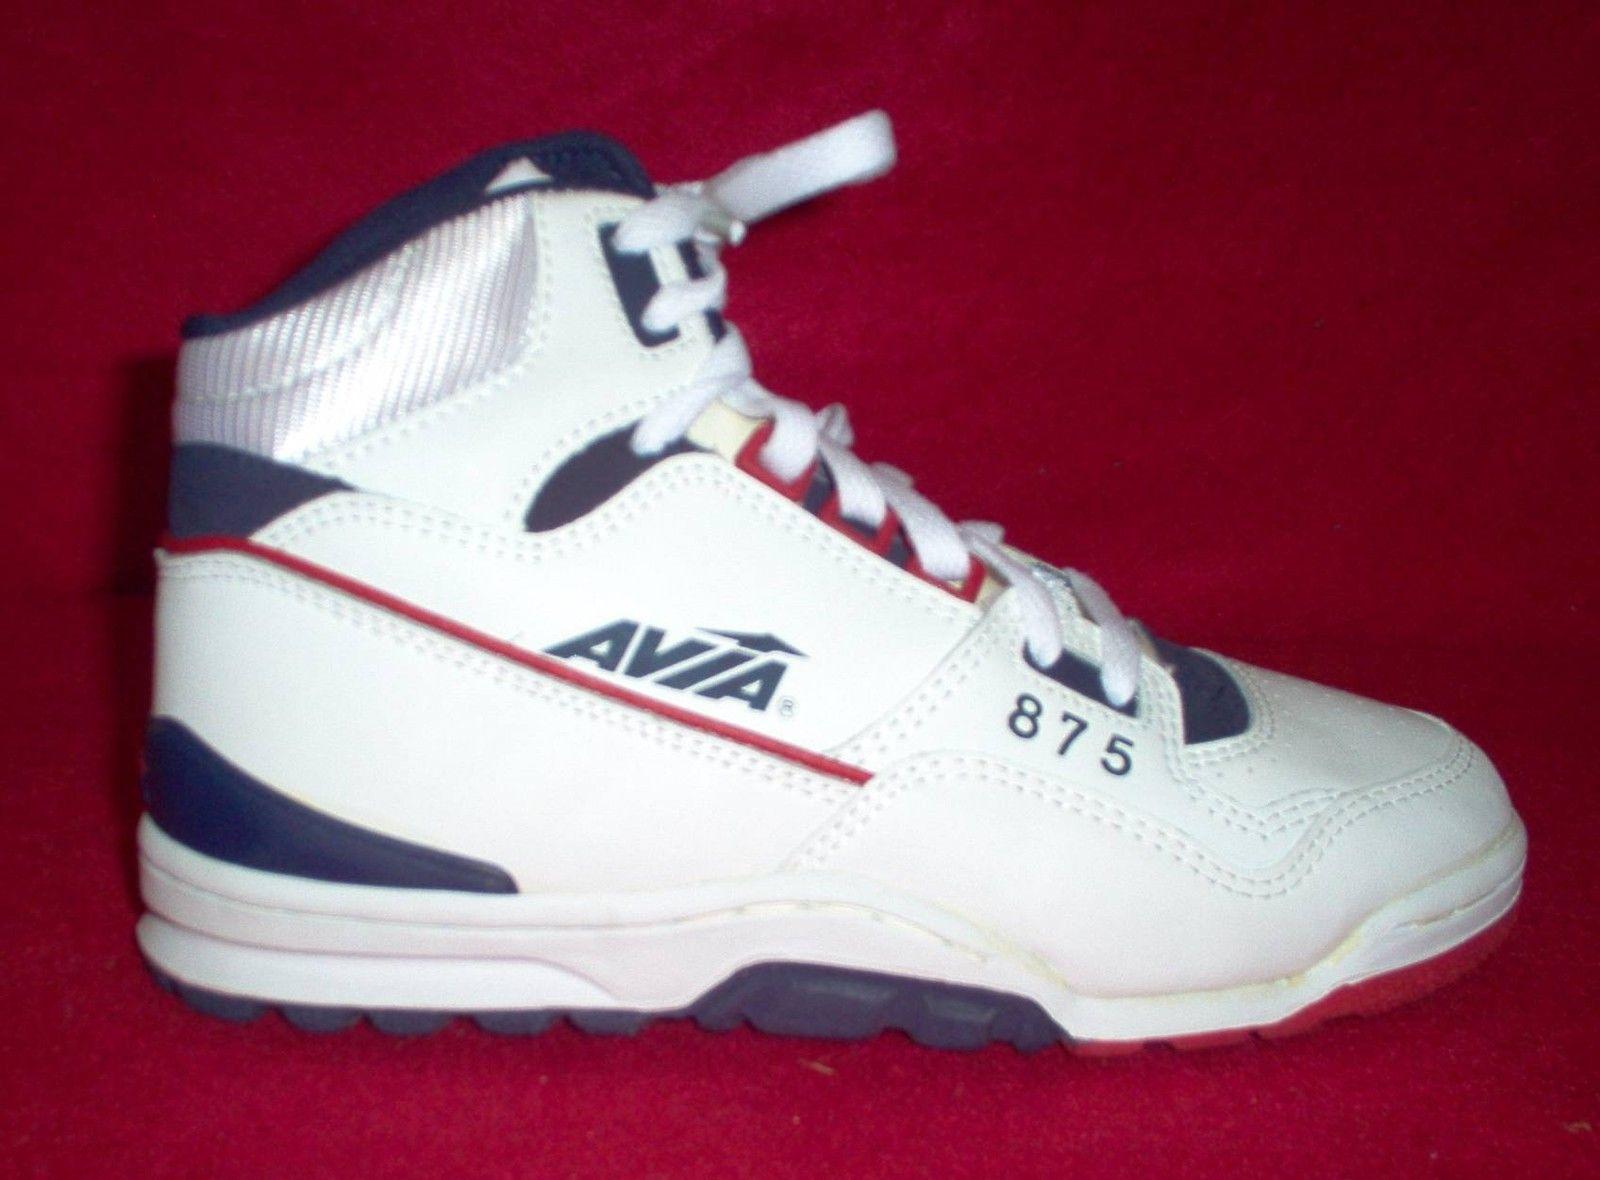 Mitre Walking Shoes